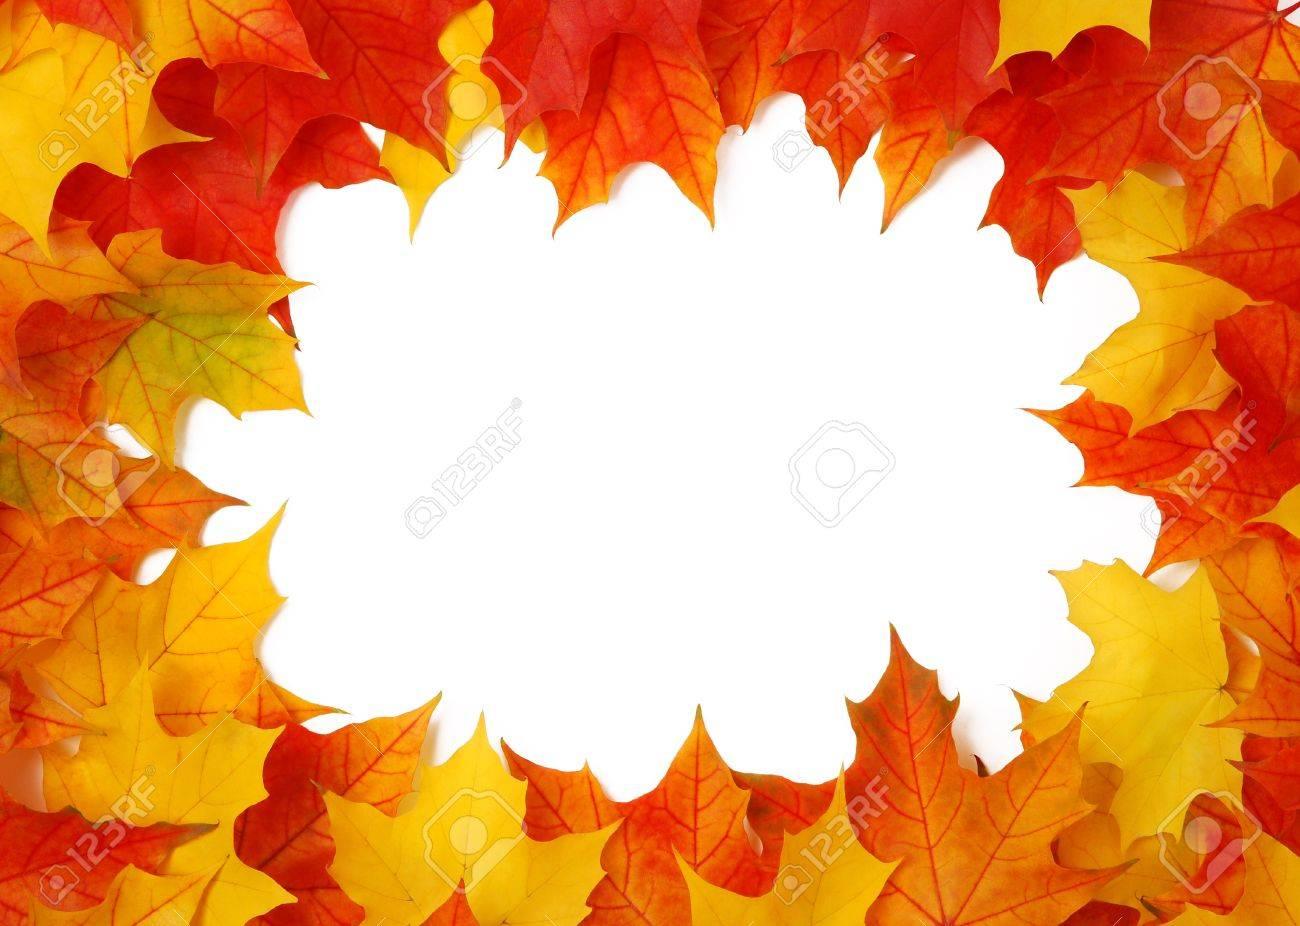 Fall leaves frame Stock Photo - 10571728